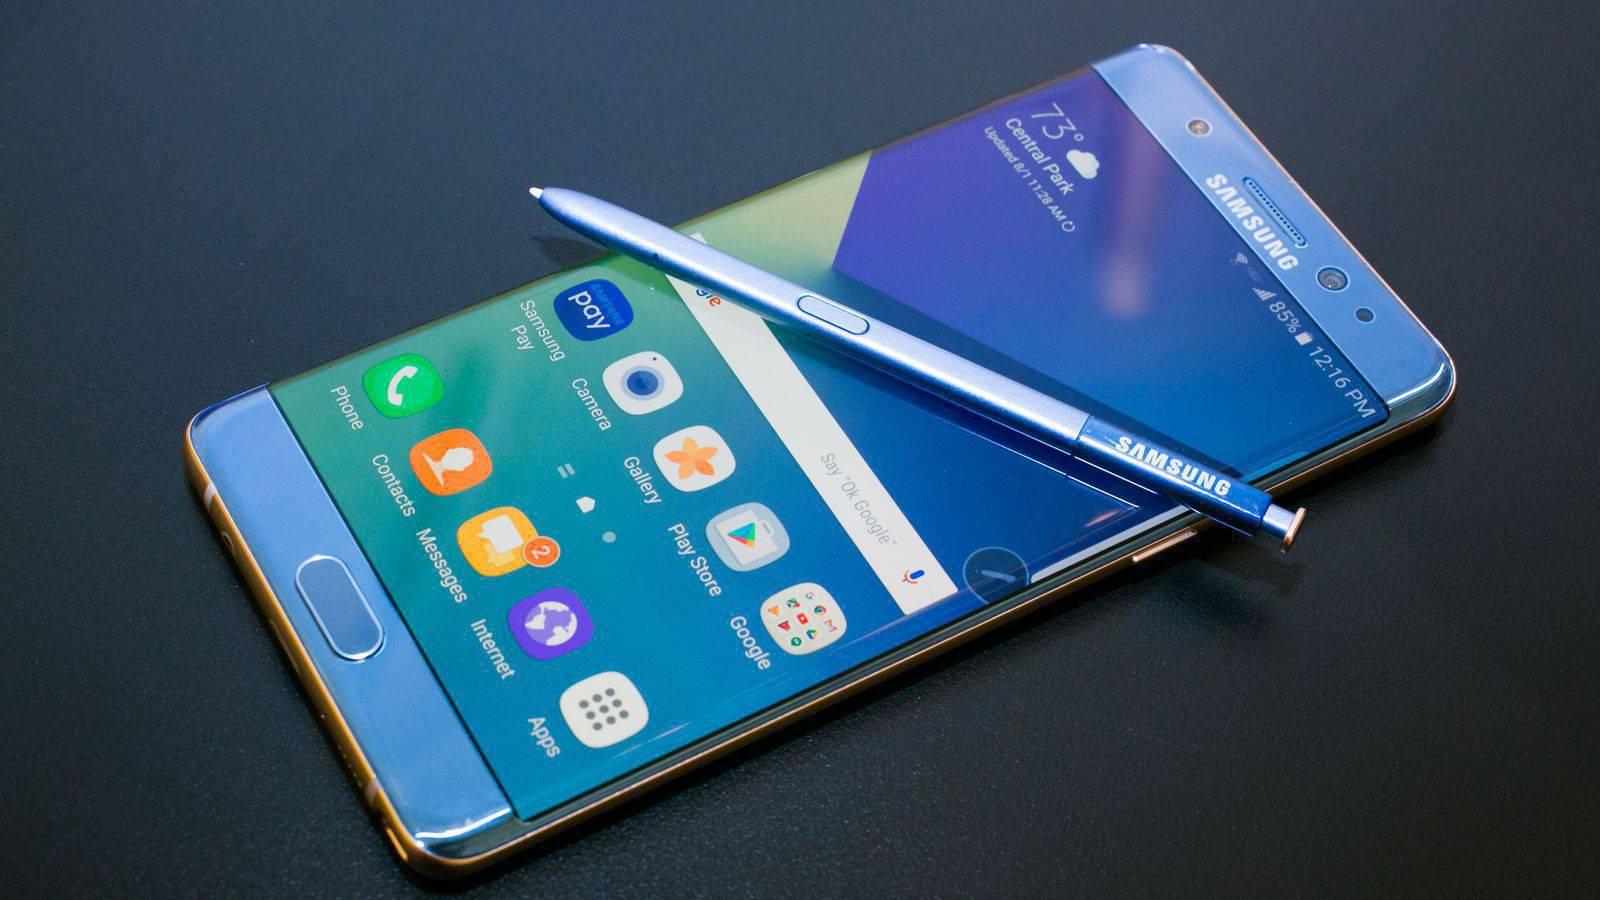 Samsung's Galaxy Note 7 phone